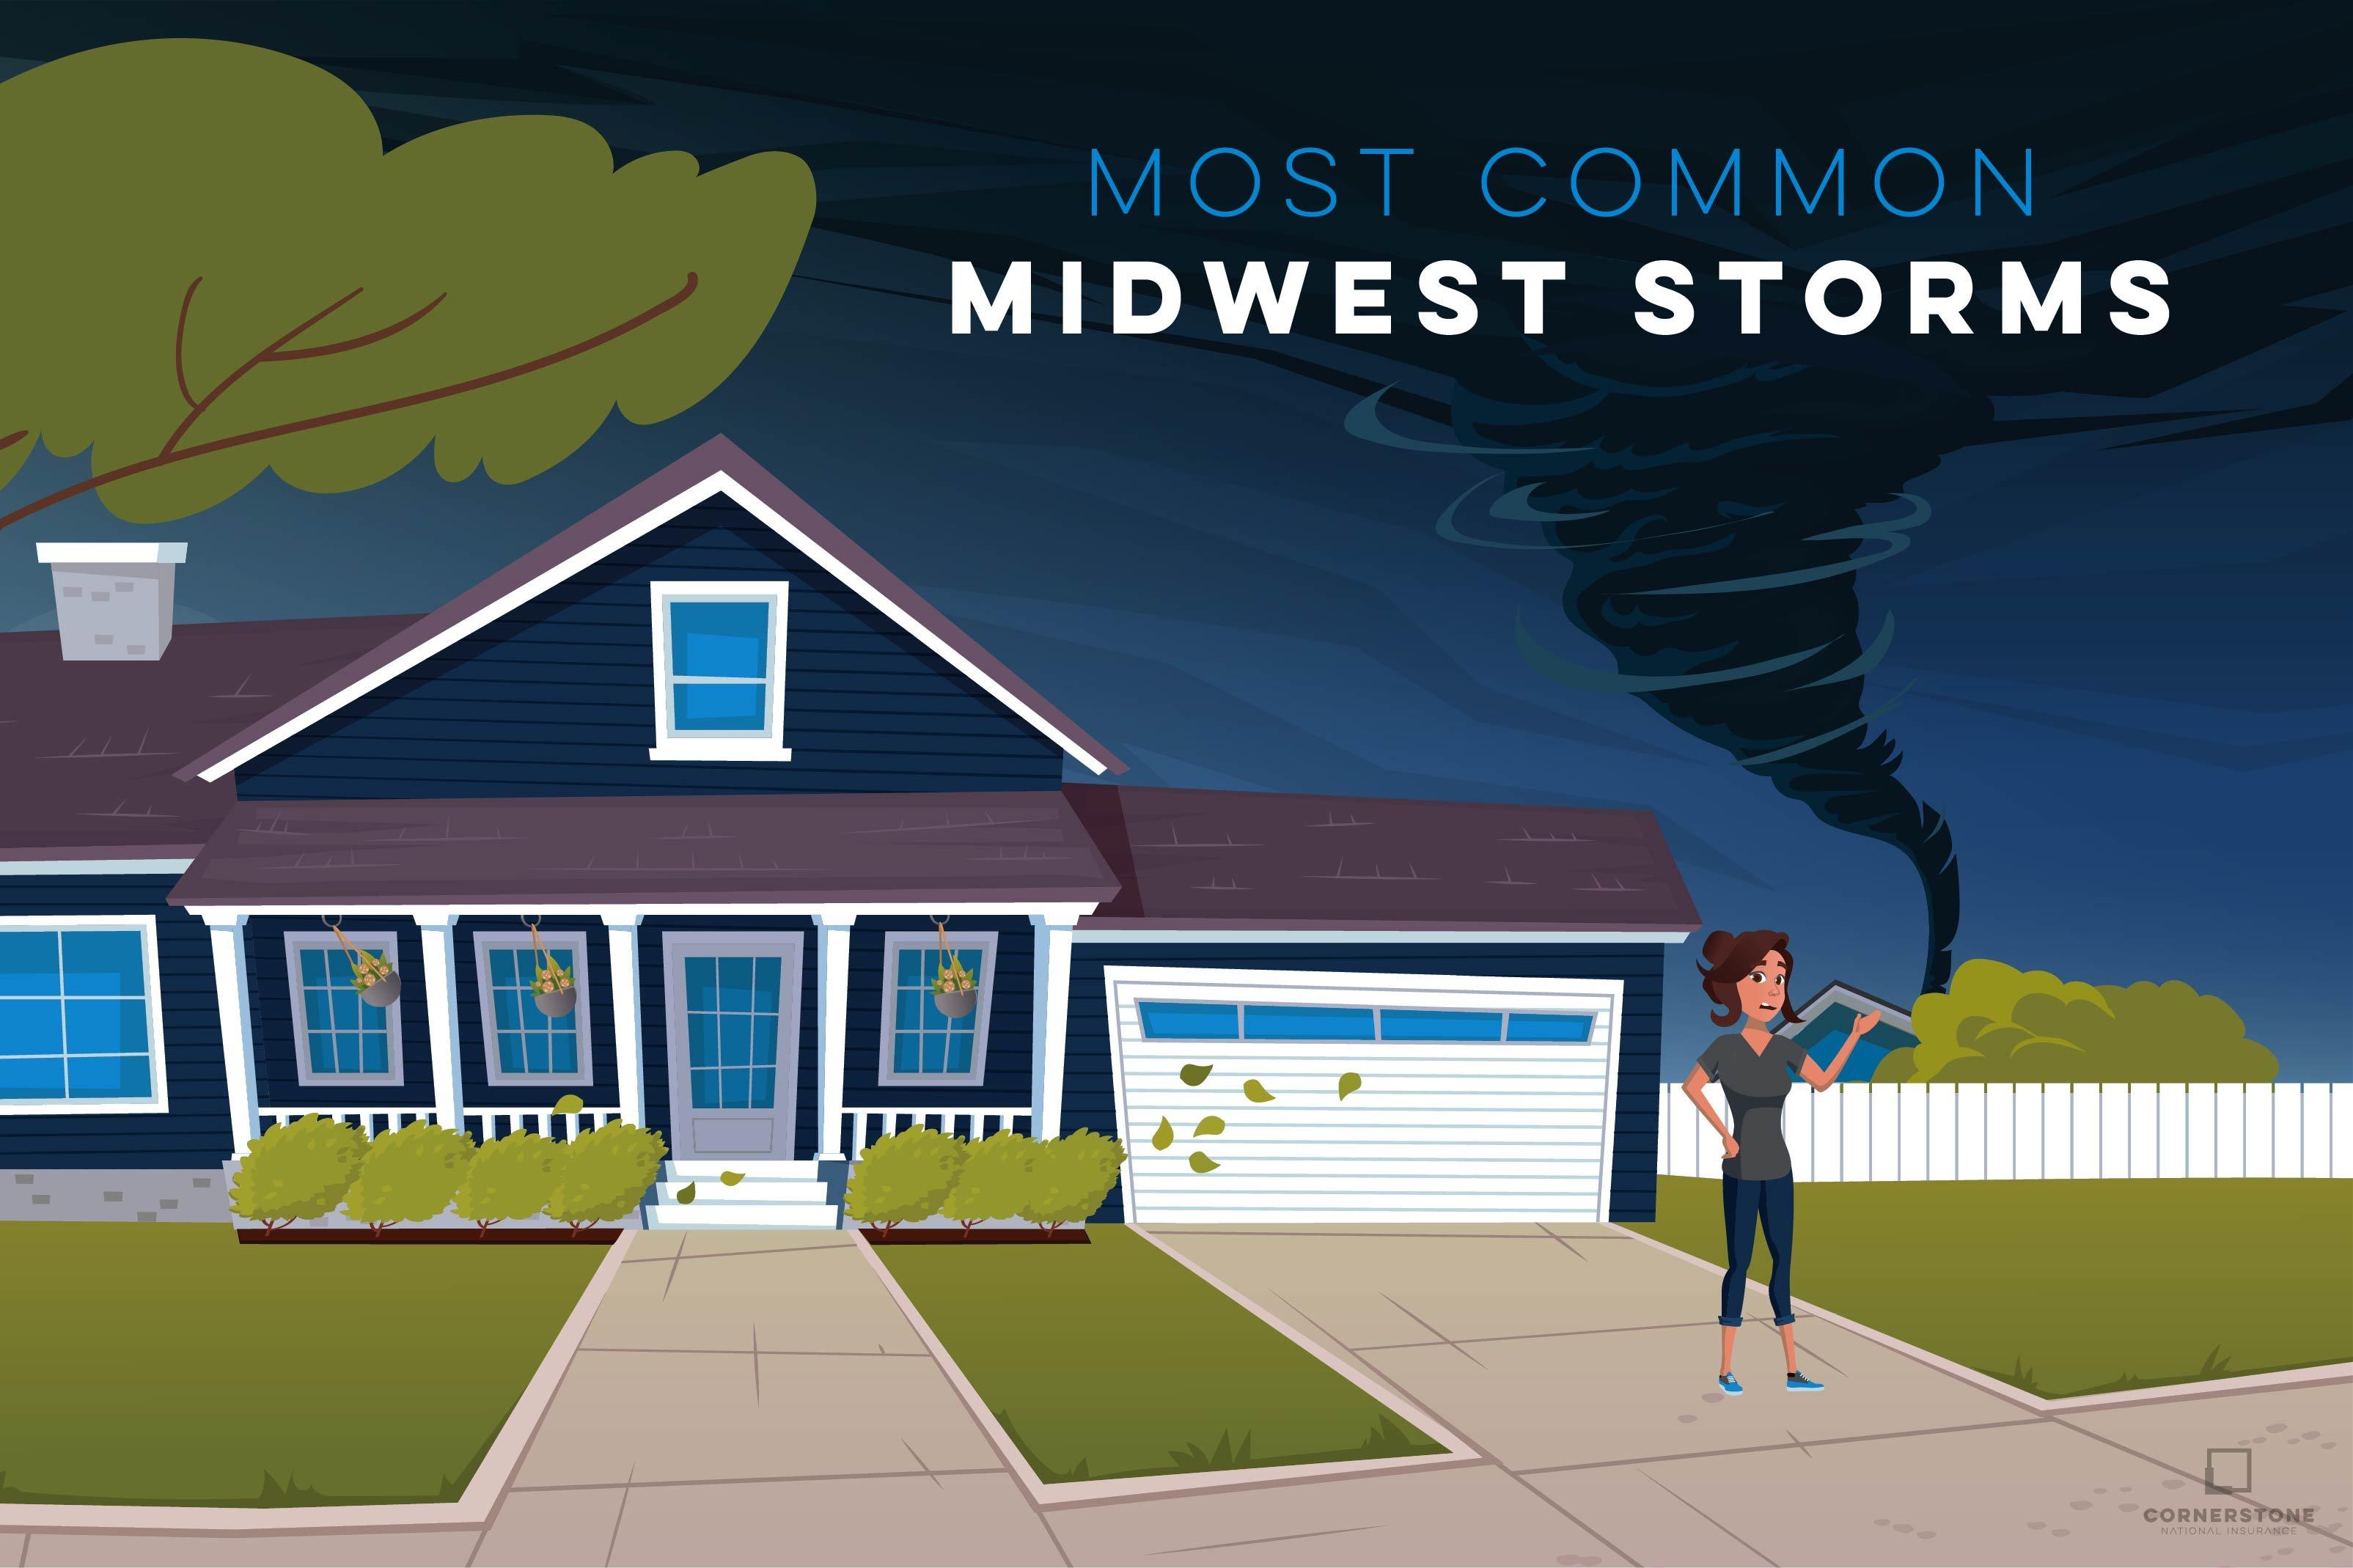 2. 50351_Most Common Storms_Tornado_Blog-01-1